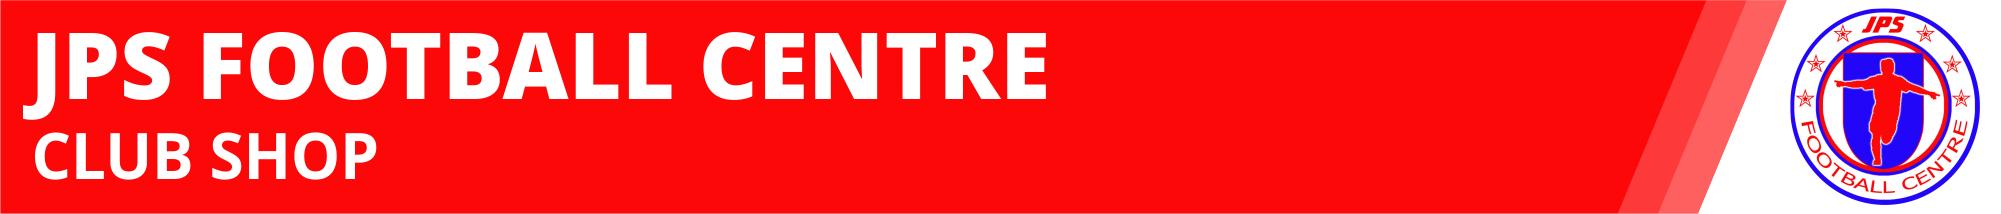 jps-football-centre-club-shop-banner.png